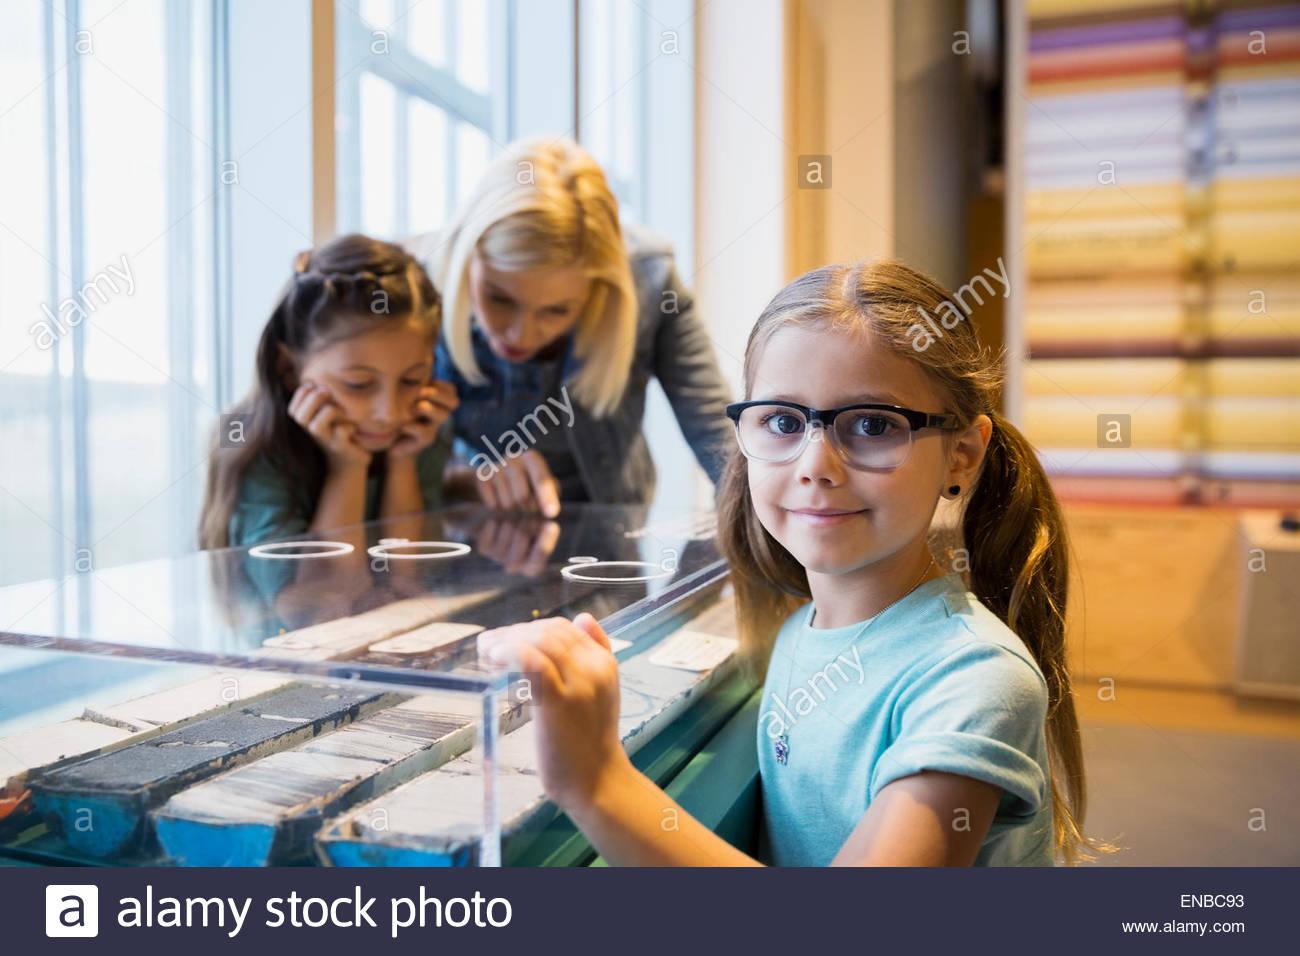 Familie Blick auf Geologie Display im Science center Stockbild